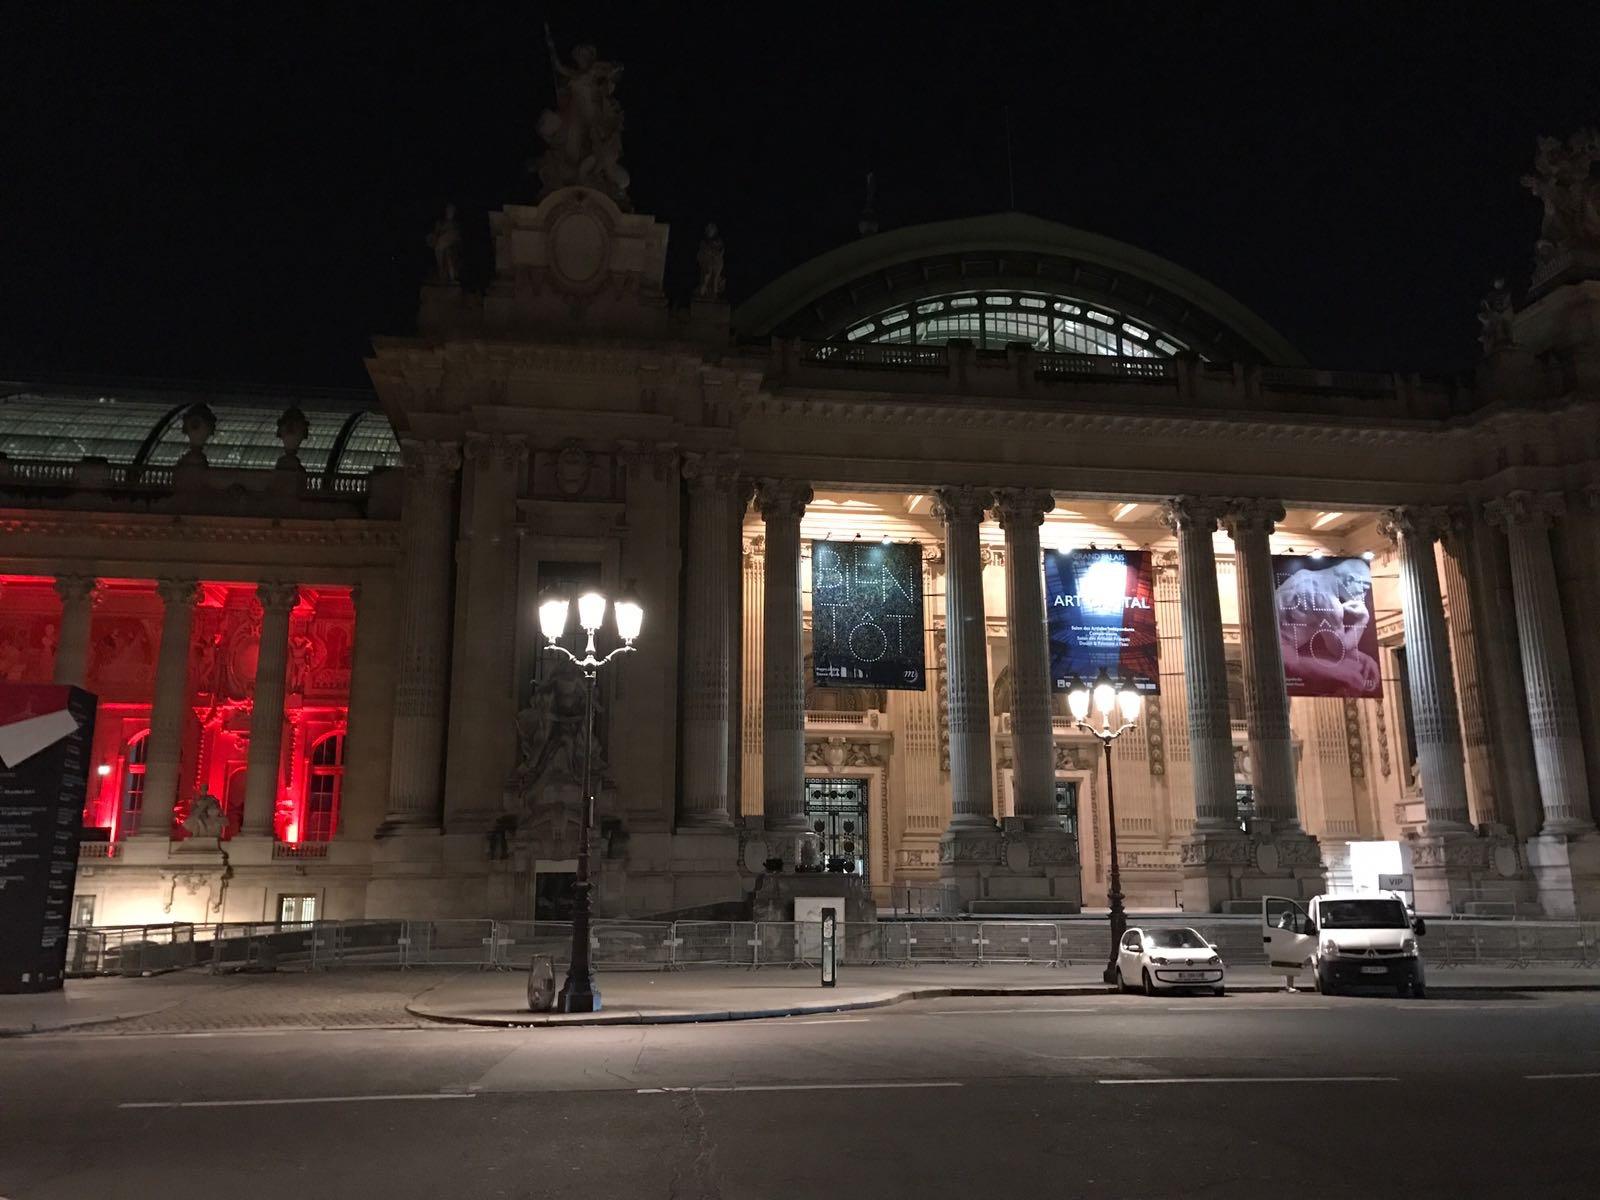 Paris (F) - Grand Palais